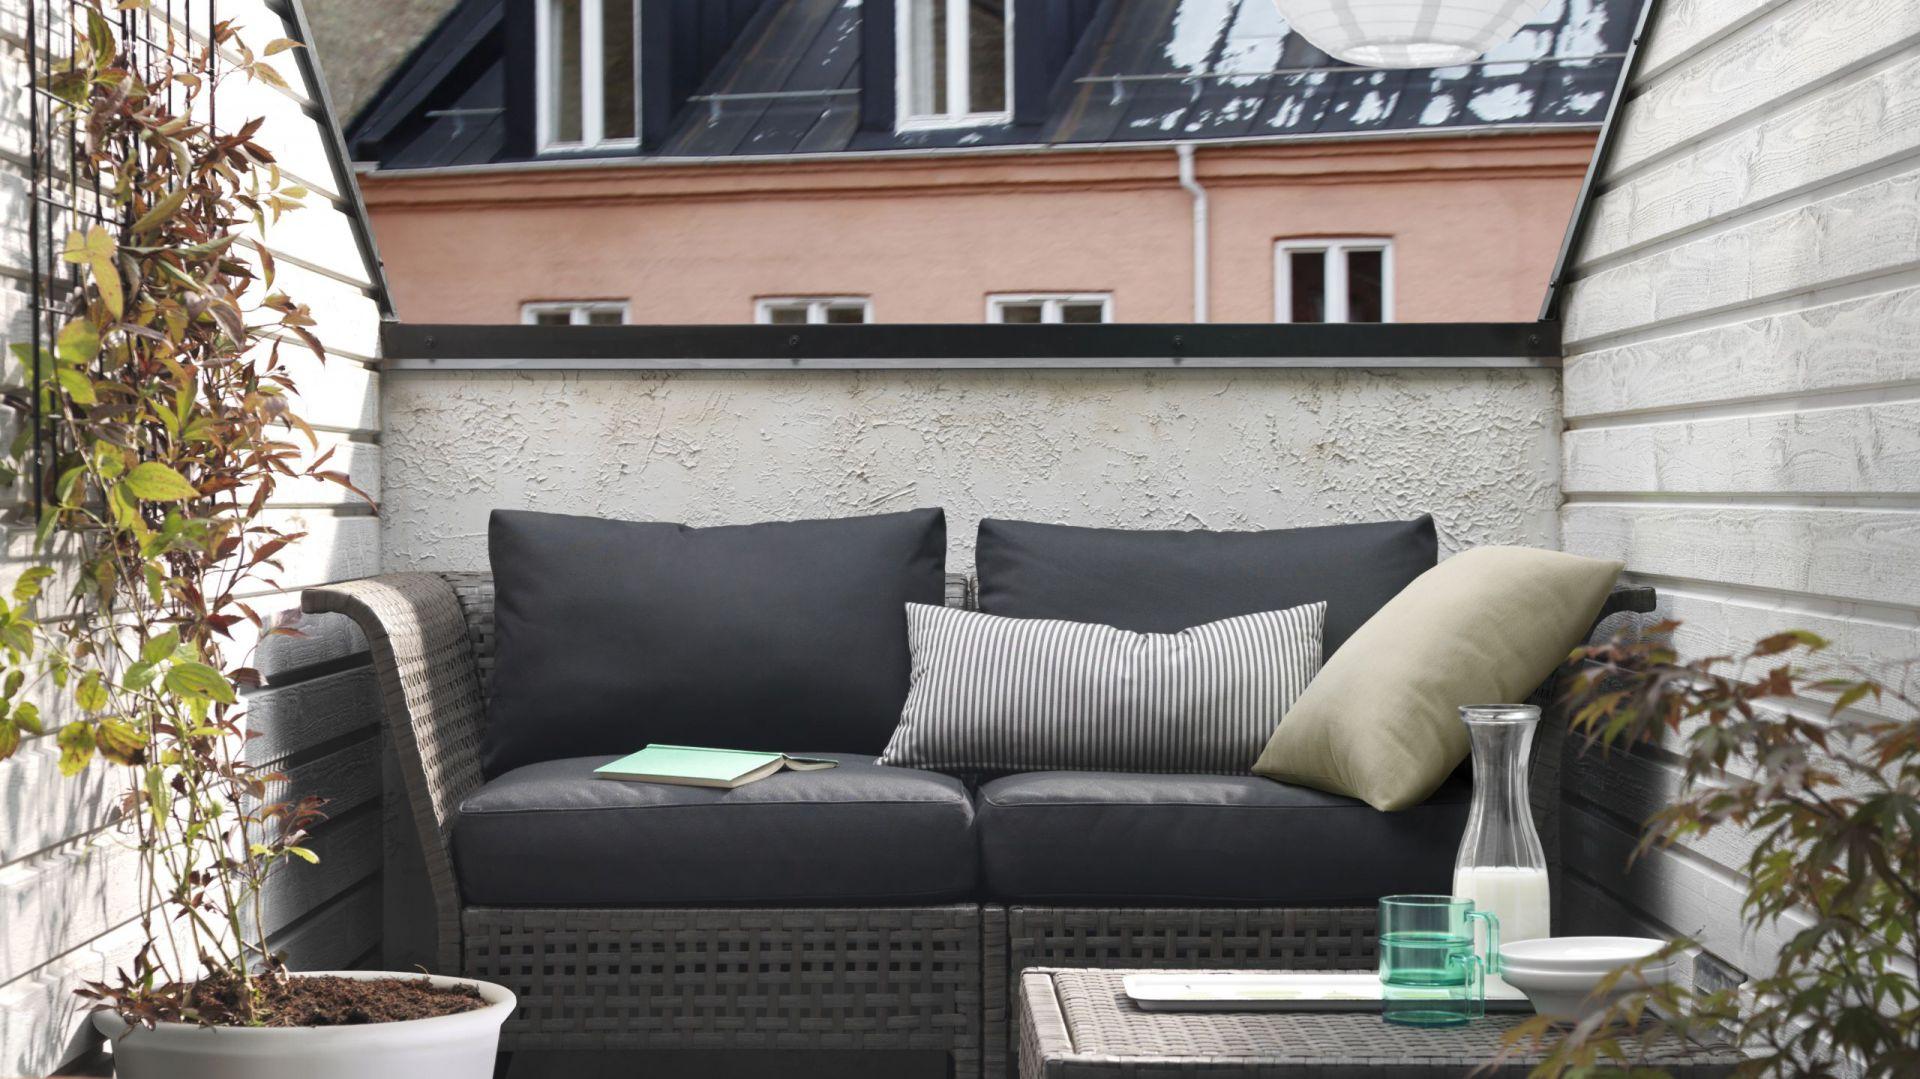 meble na taras fot ikea meble do ogrodu na balkon i taras 20 pi knych zestaw w strona 10. Black Bedroom Furniture Sets. Home Design Ideas